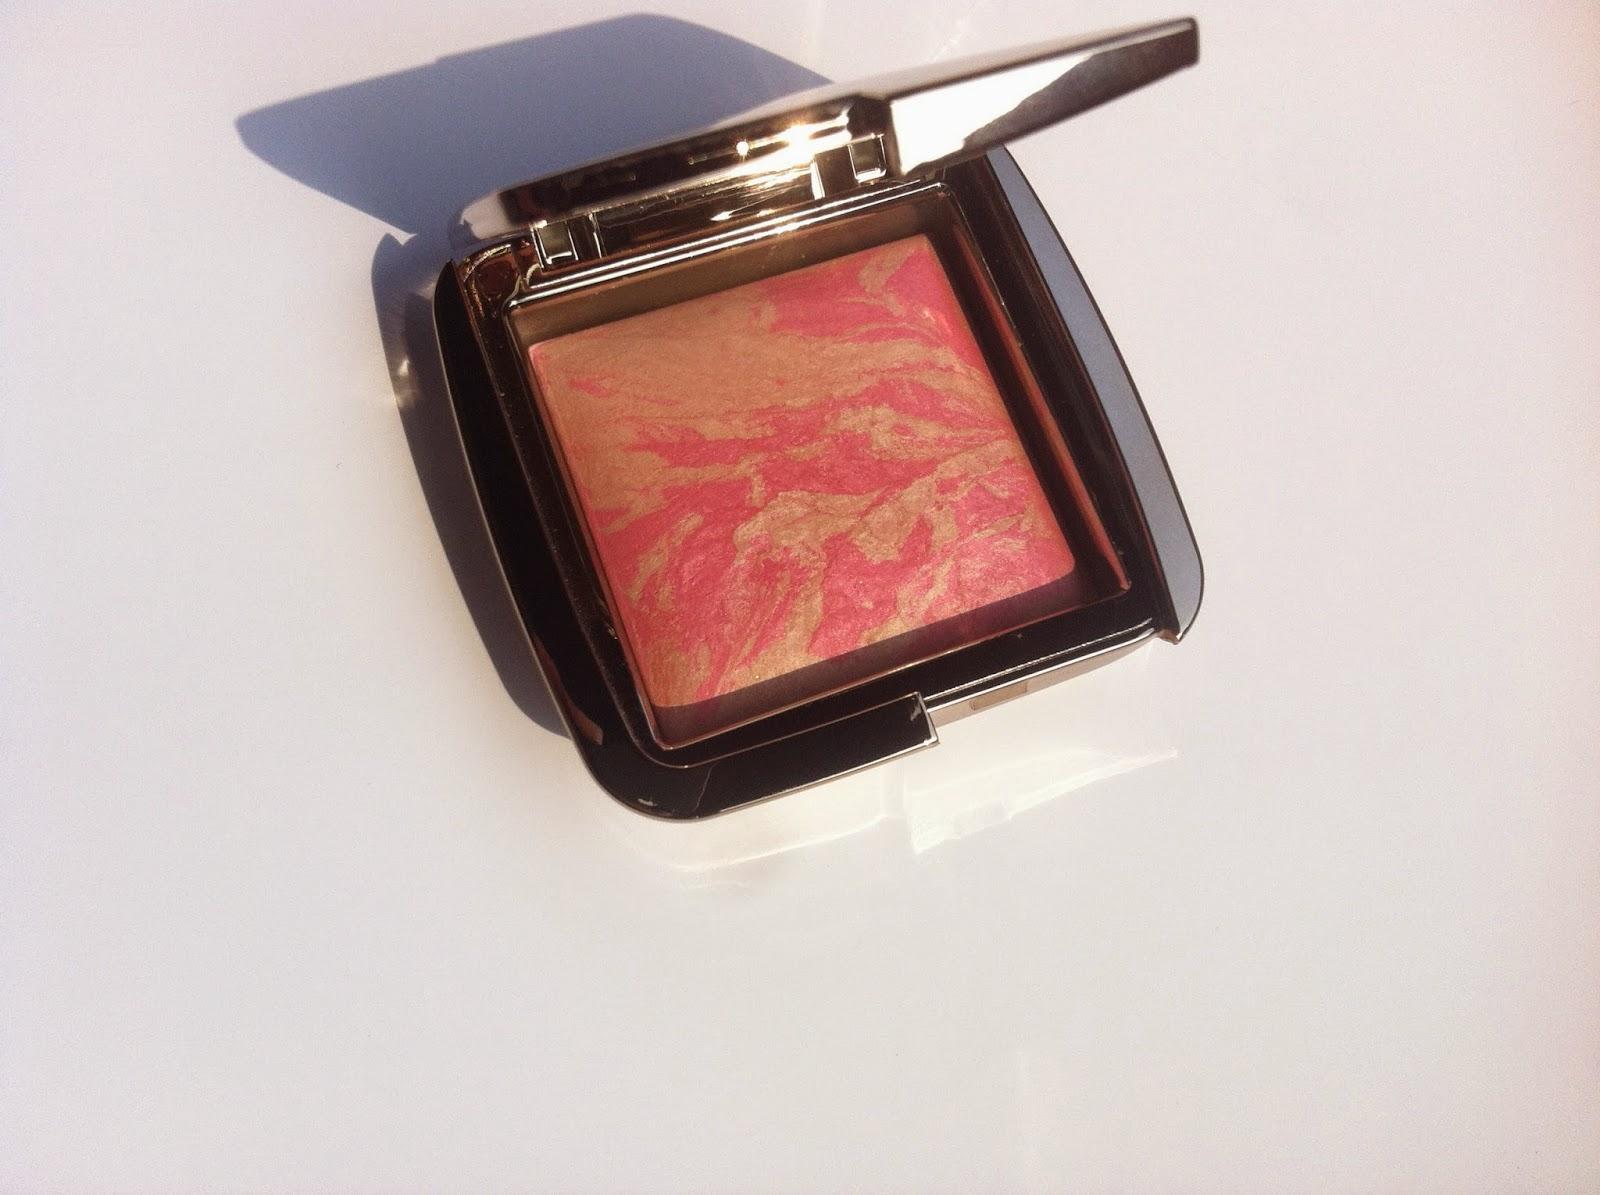 hourglass cosmetics italia, ambient lighting blush review recensione, hourglass ambient lighting blush luminous flush swatch